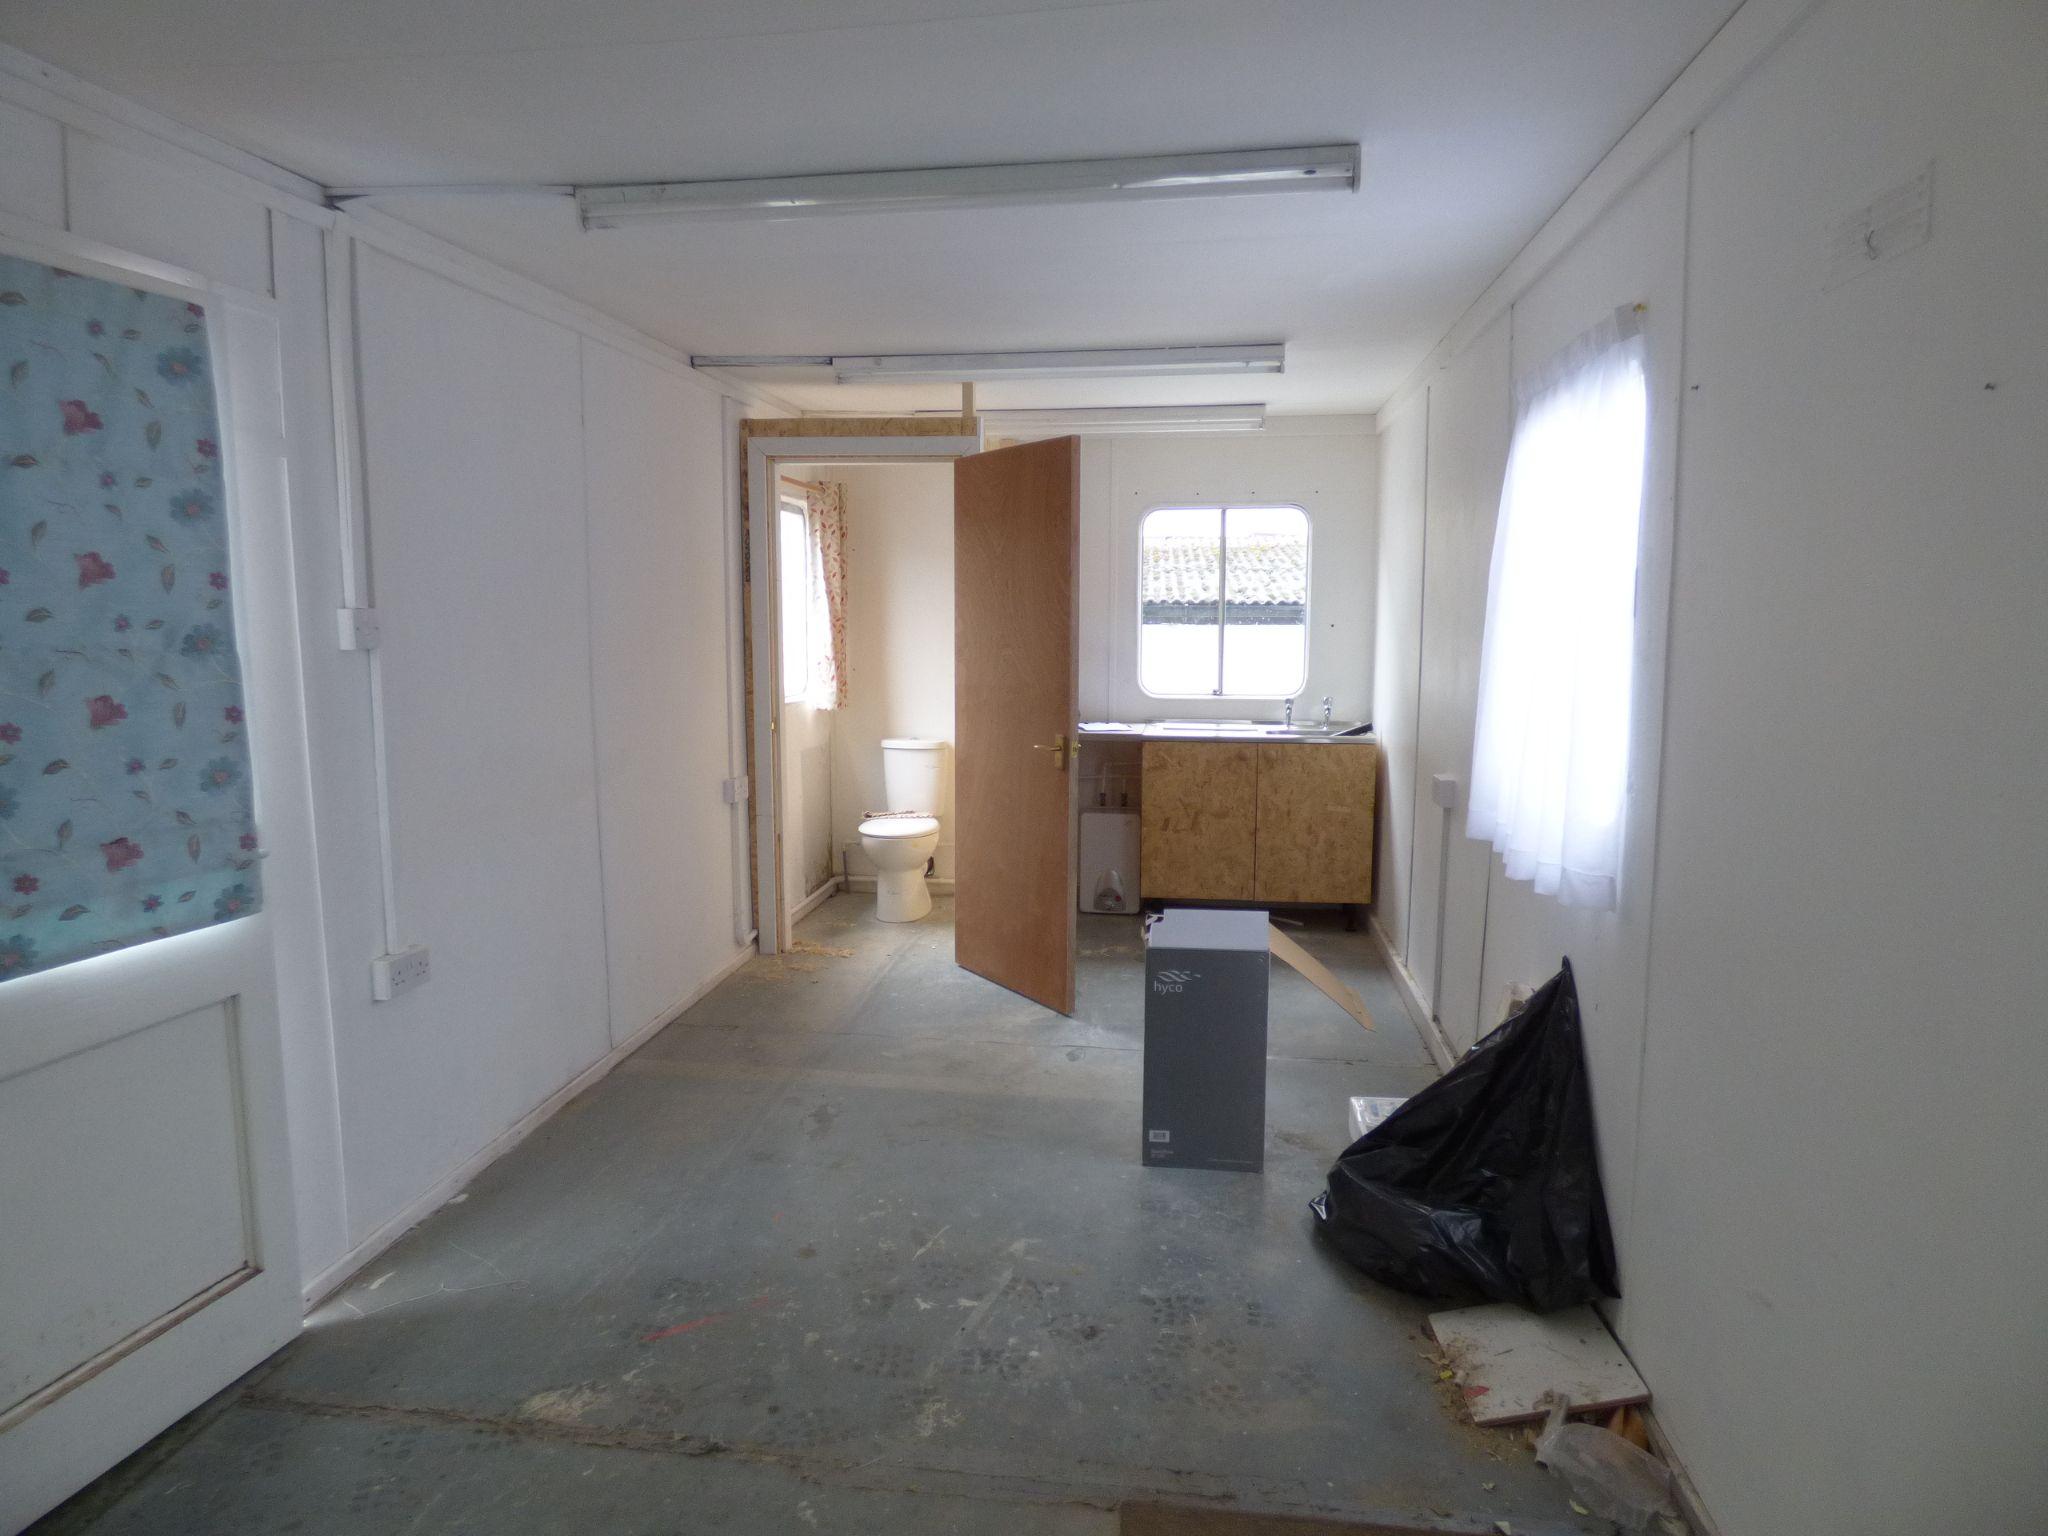 Office To Rent - Portacabin Photo 2